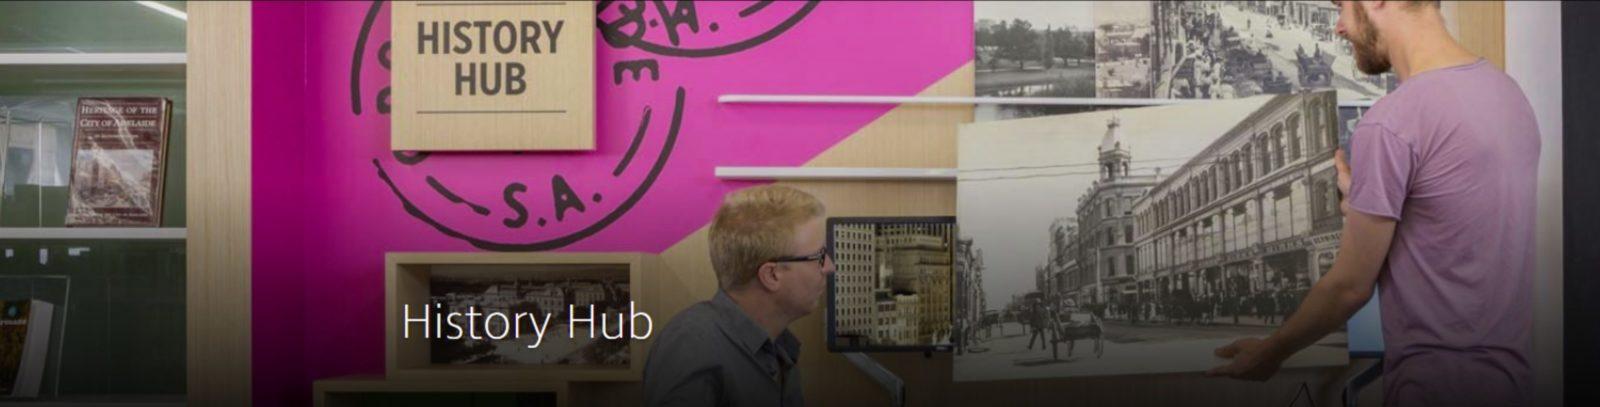 Adelaide City Library History Hub